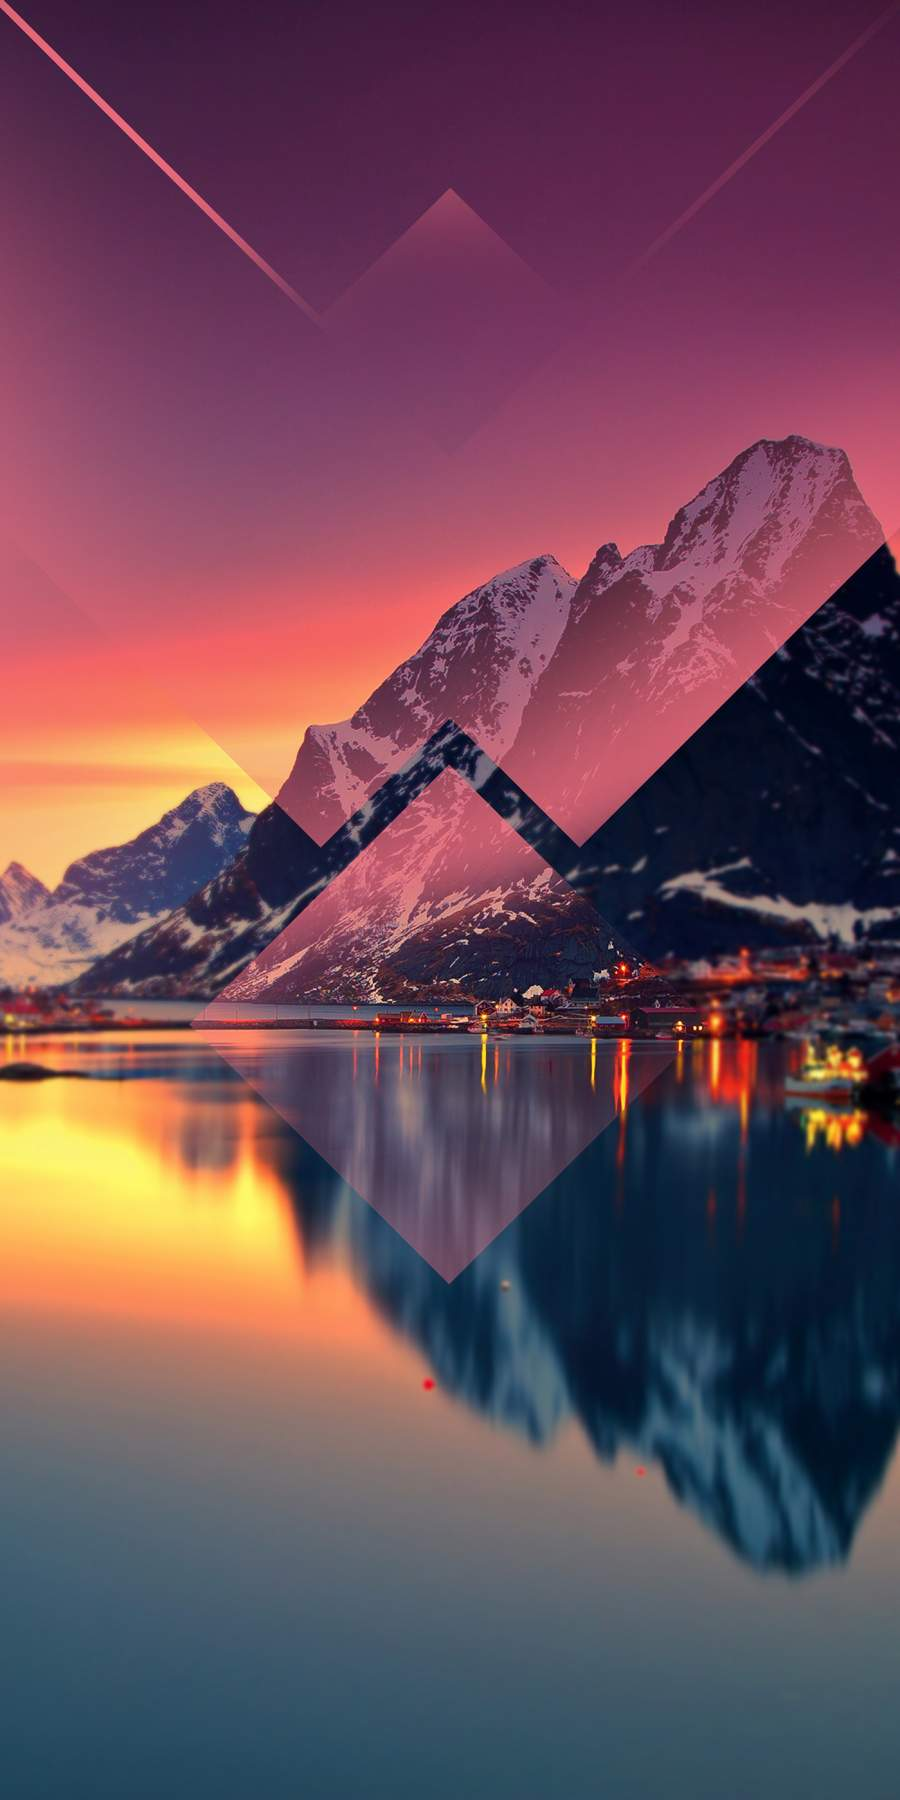 Mountain Lake Reflection Sunset iPhone Wallpaper